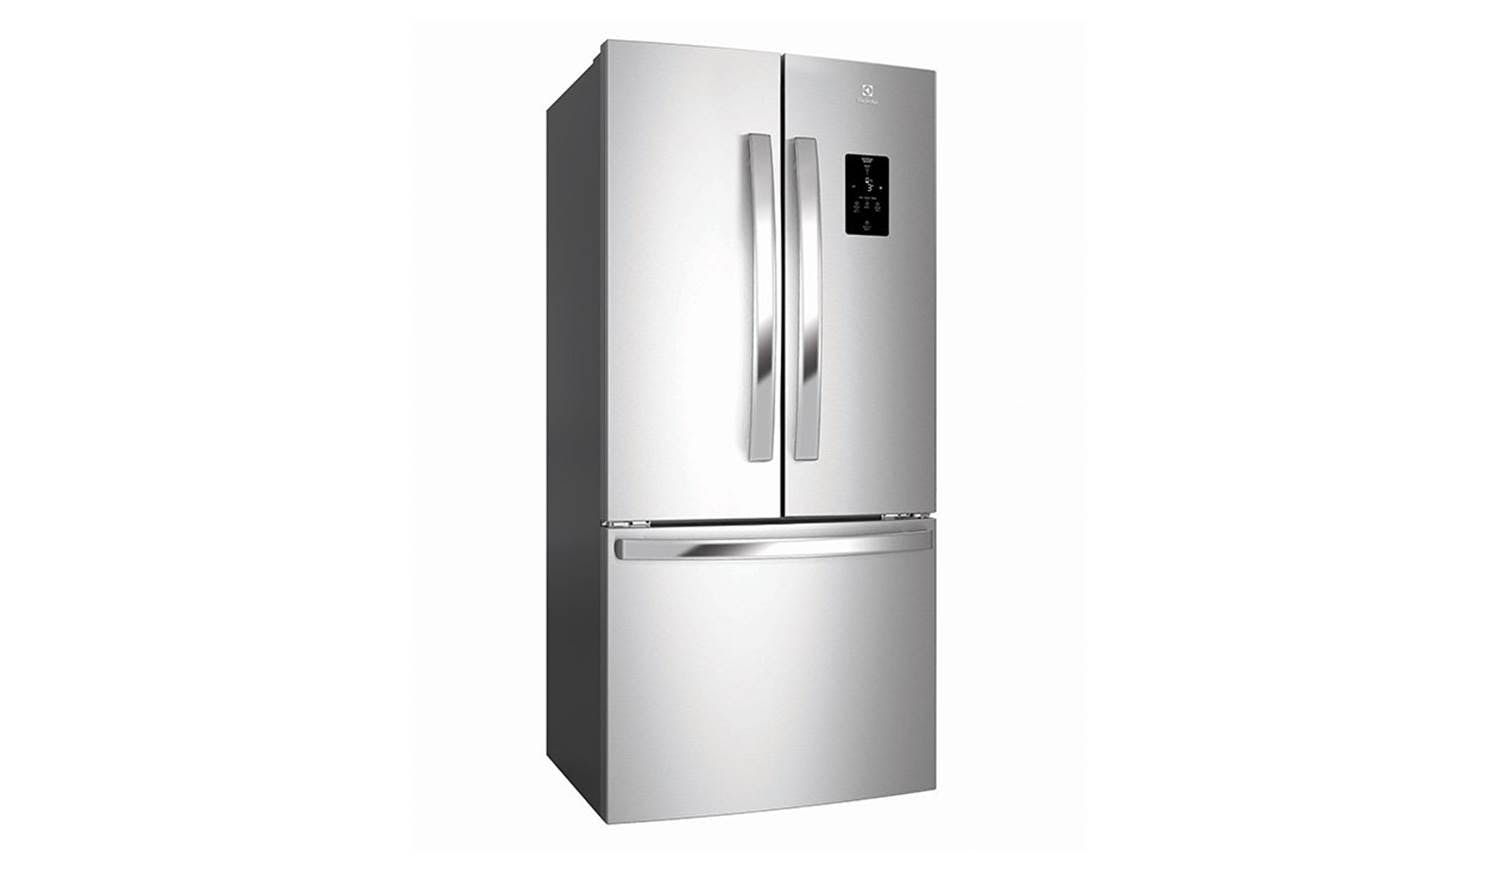 Electrolux EHE5220AA 520L 3 Doors Refrigerator | Harvey Norman Singapore